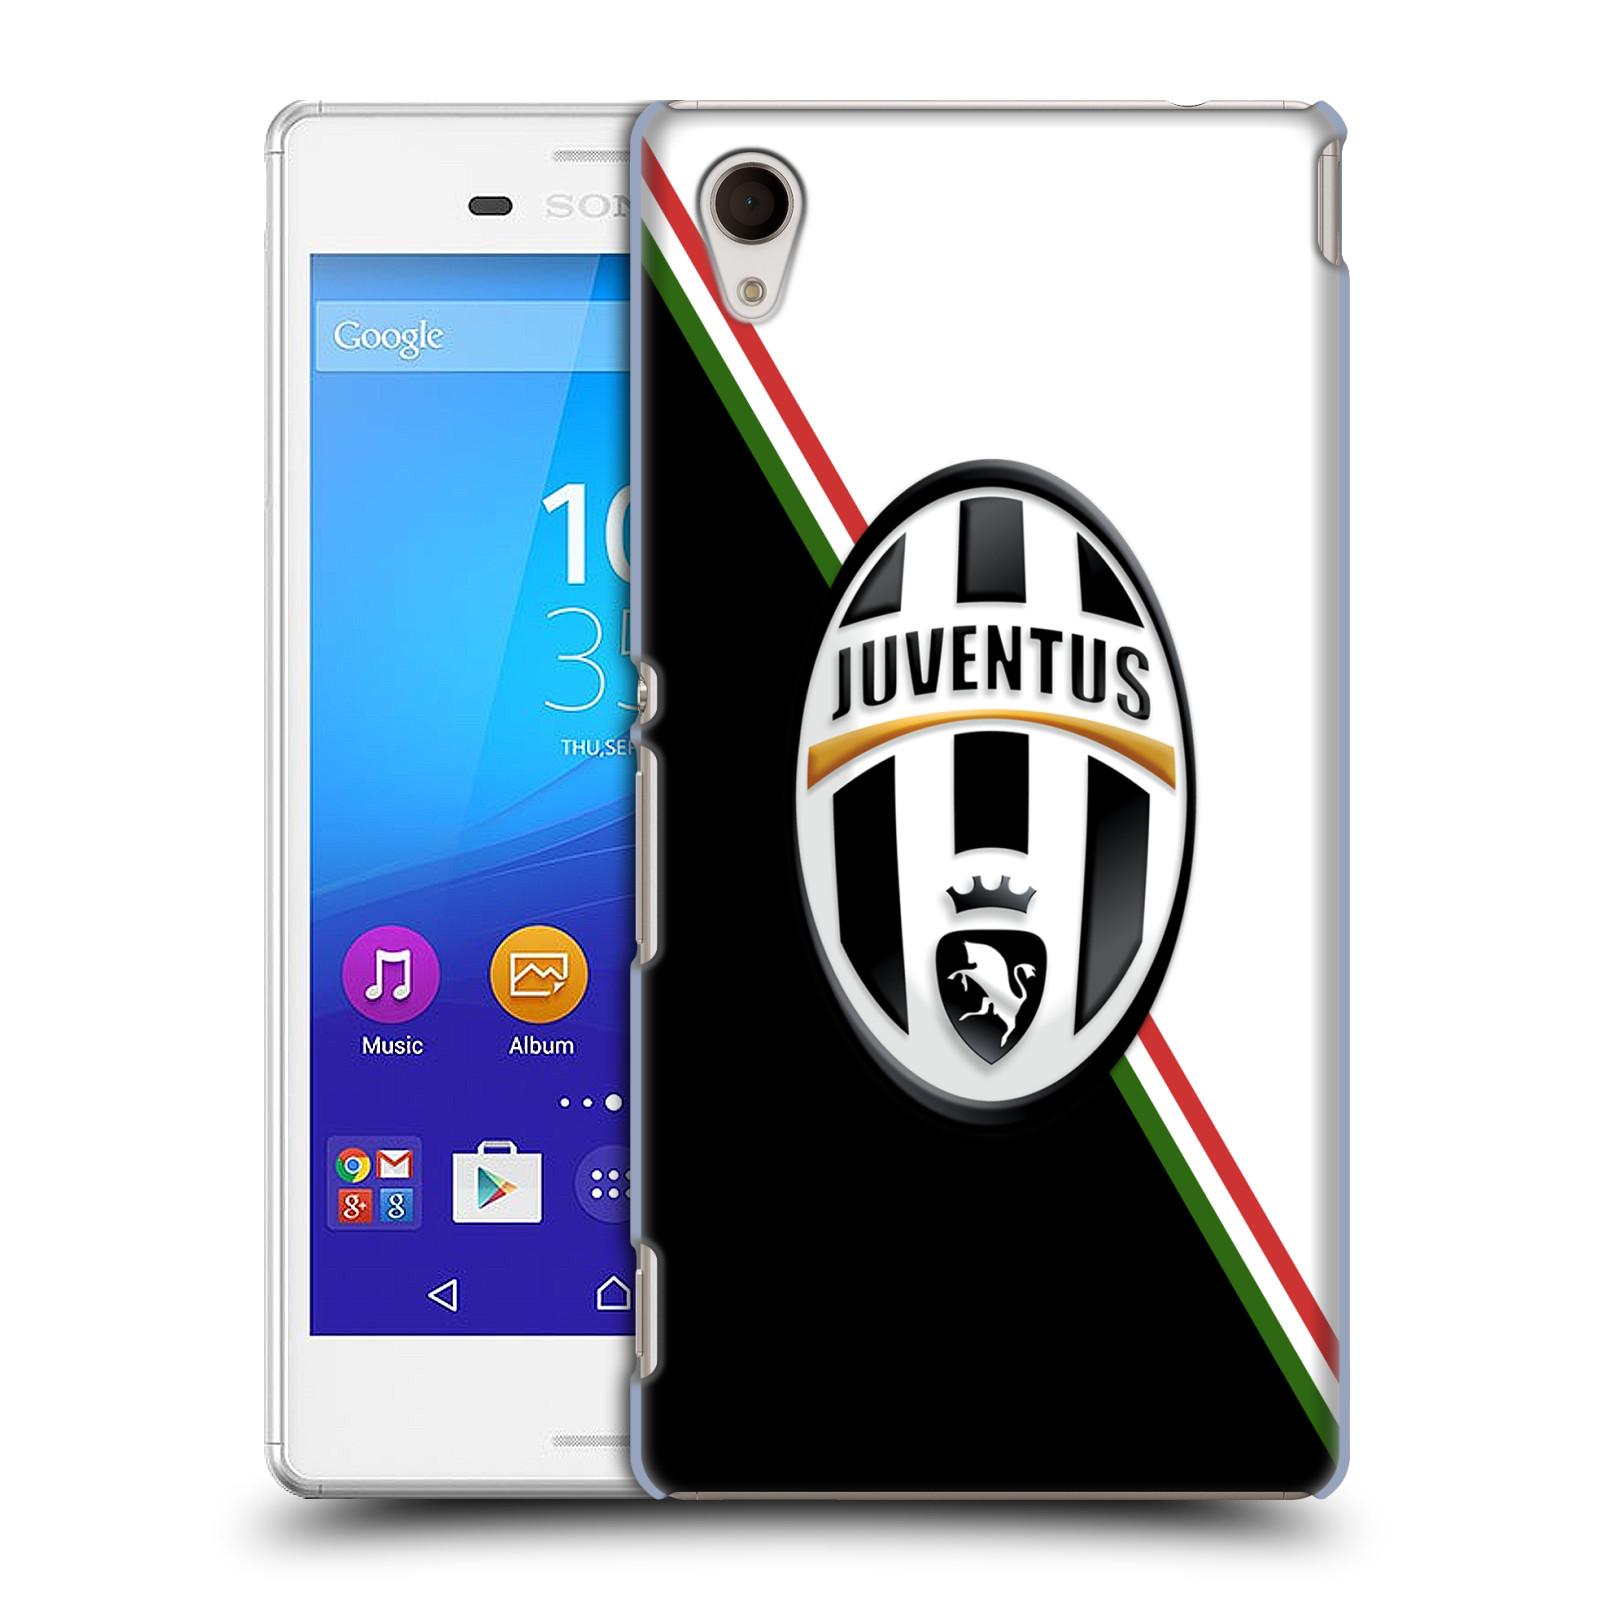 Plastové pouzdro na mobil Sony Xperia M4 Aqua E2303 HEAD CASE Juventus FC - Black and White (Plastový kryt či obal na mobilní telefon Juventus FC Official pro Sony Xperia M4 Aqua a M4 Aqua Dual SIM)